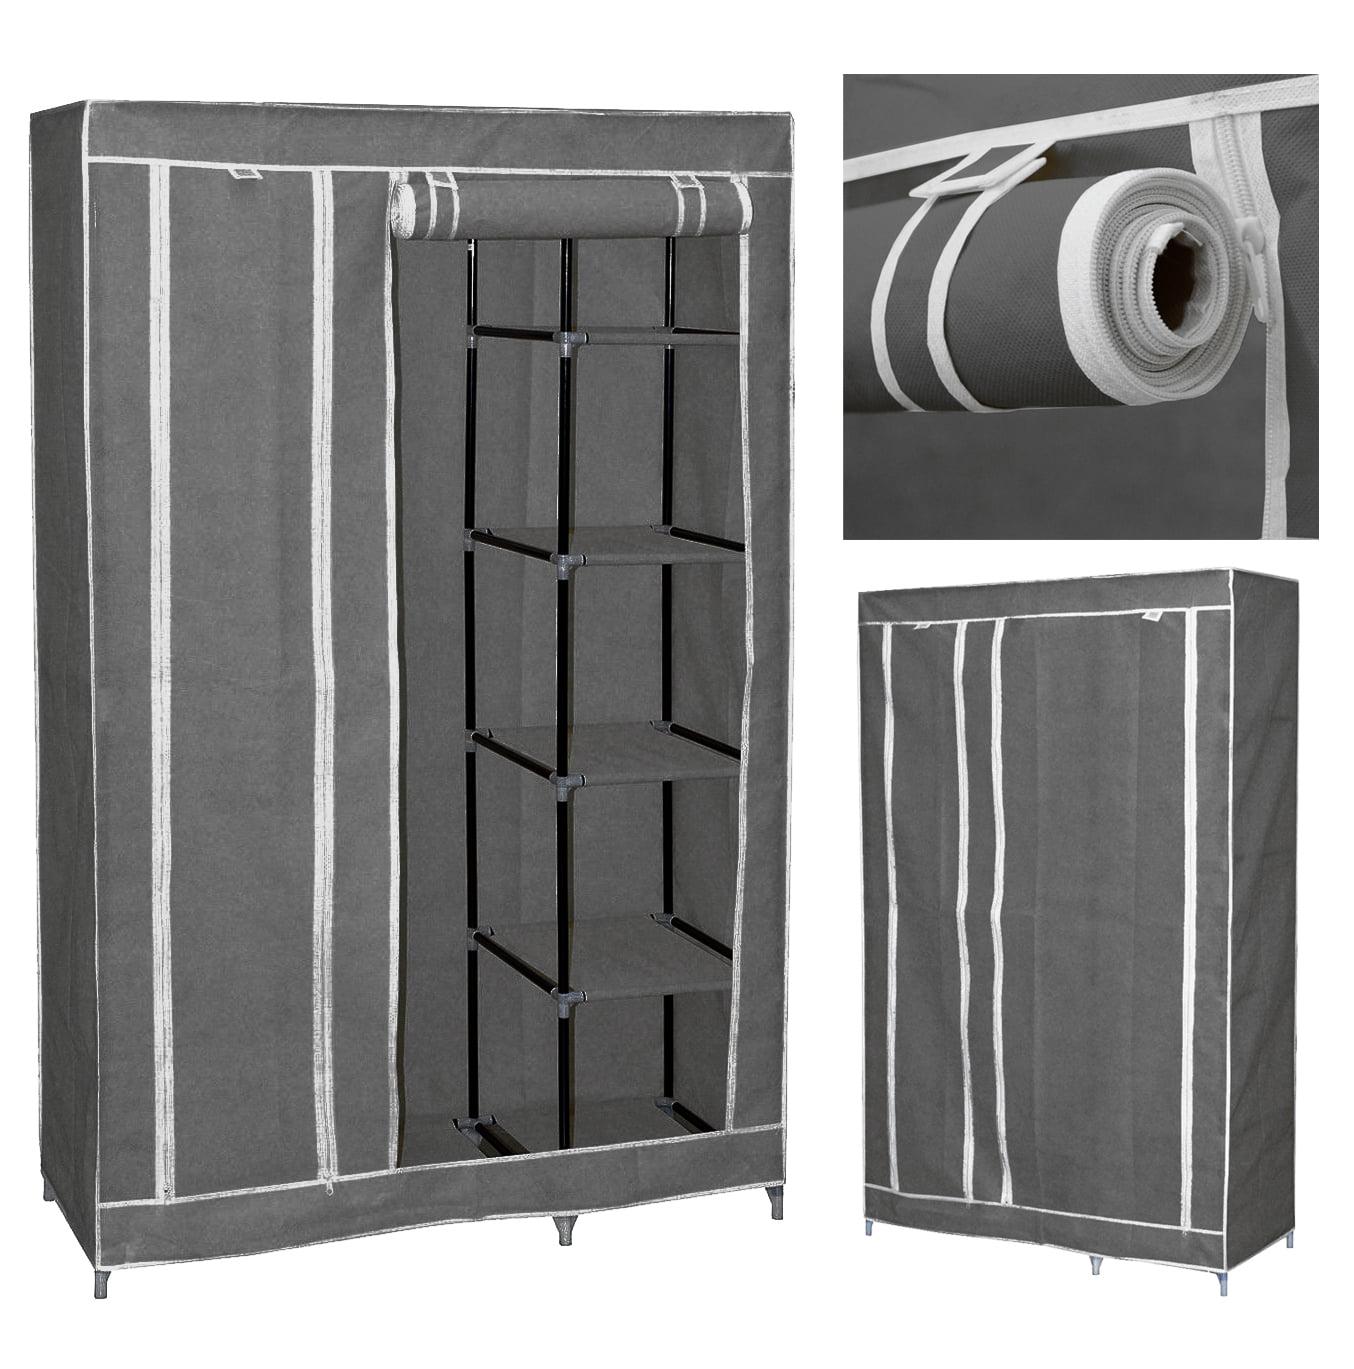 "New 69"" Portable Closet Storage Organizer Wardrobe Clothes Rack with Shelves"